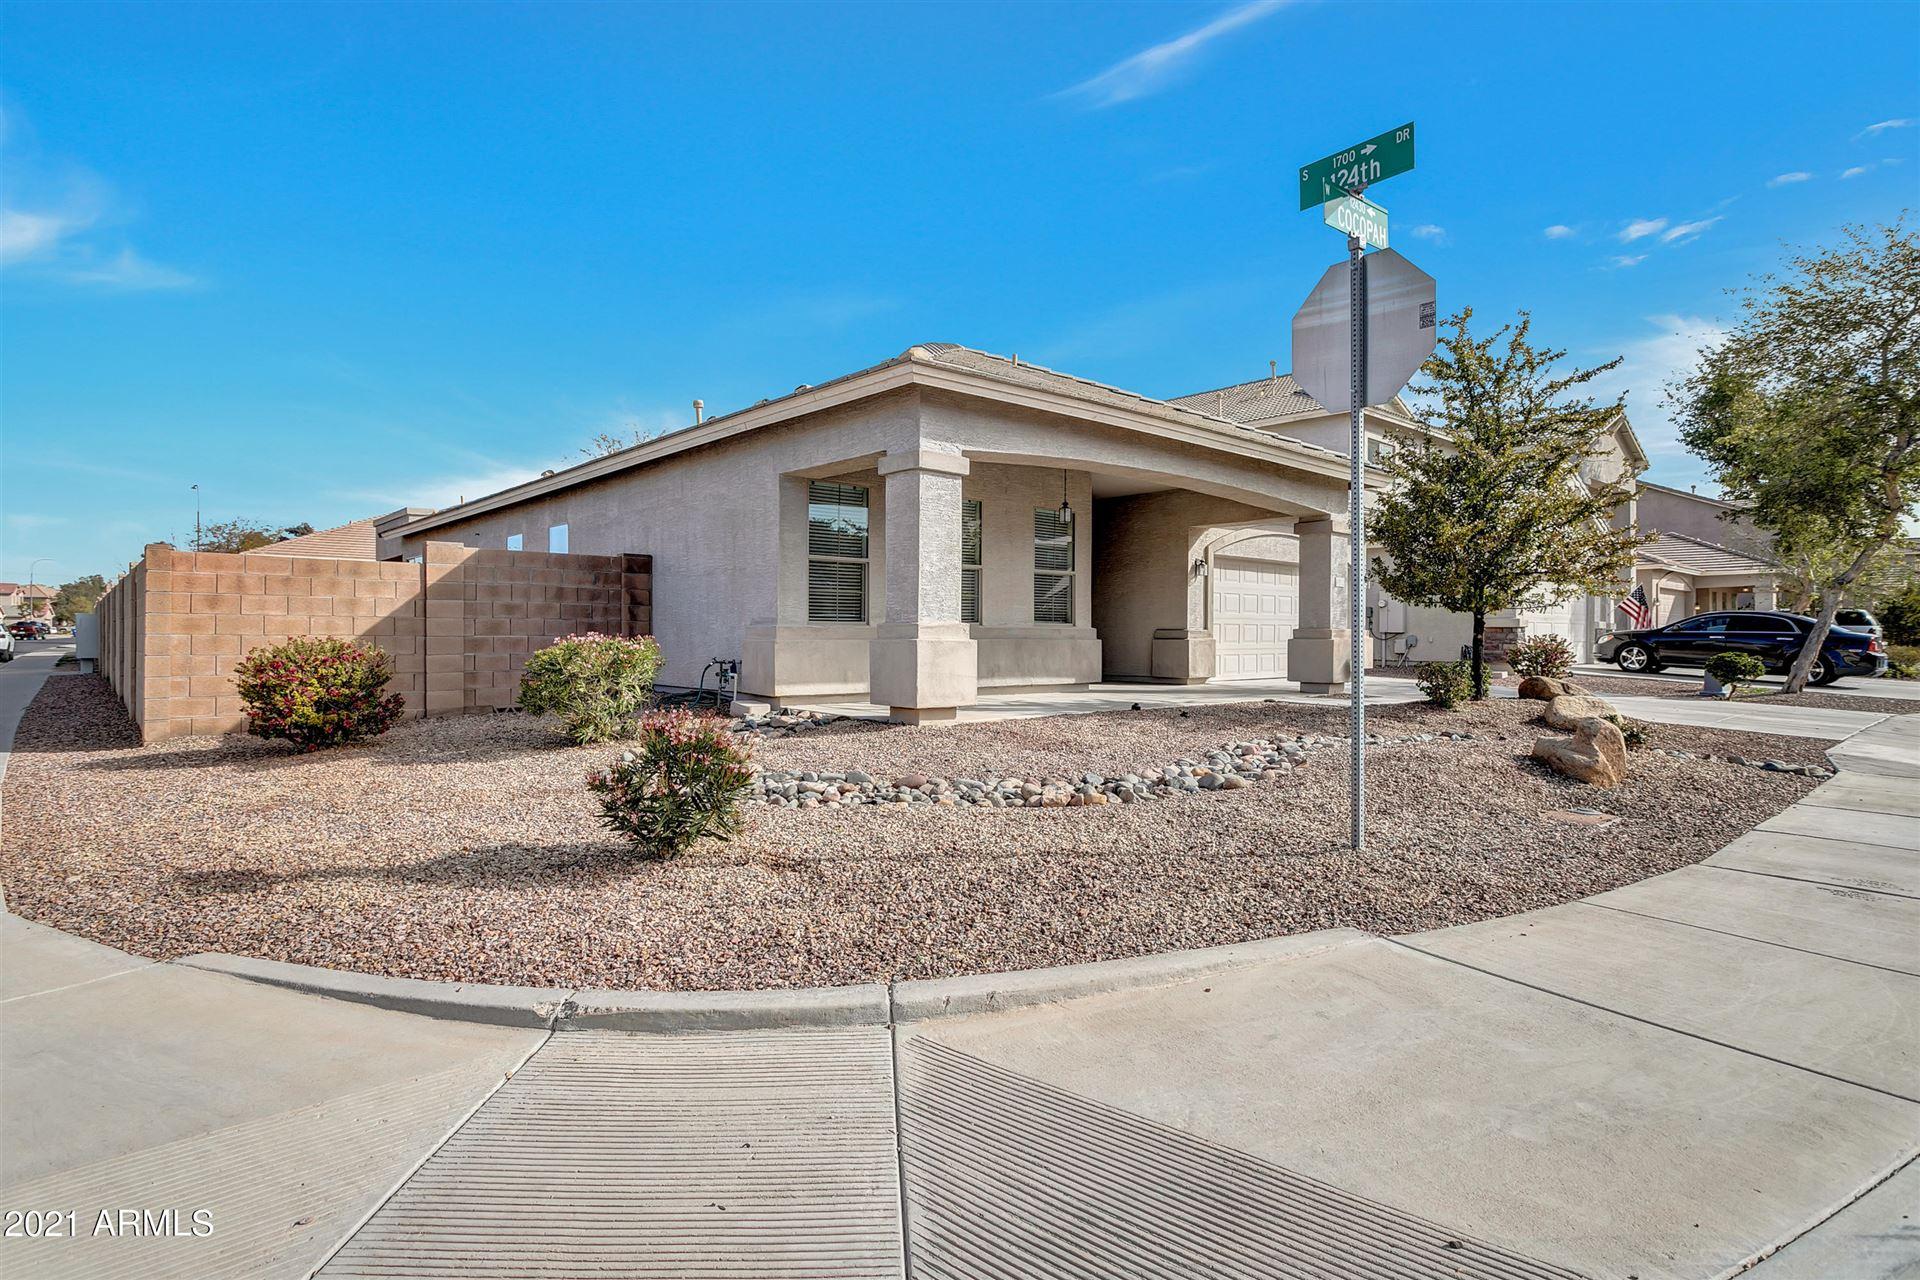 Photo of 12422 W COCOPAH Street, Avondale, AZ 85323 (MLS # 6200622)